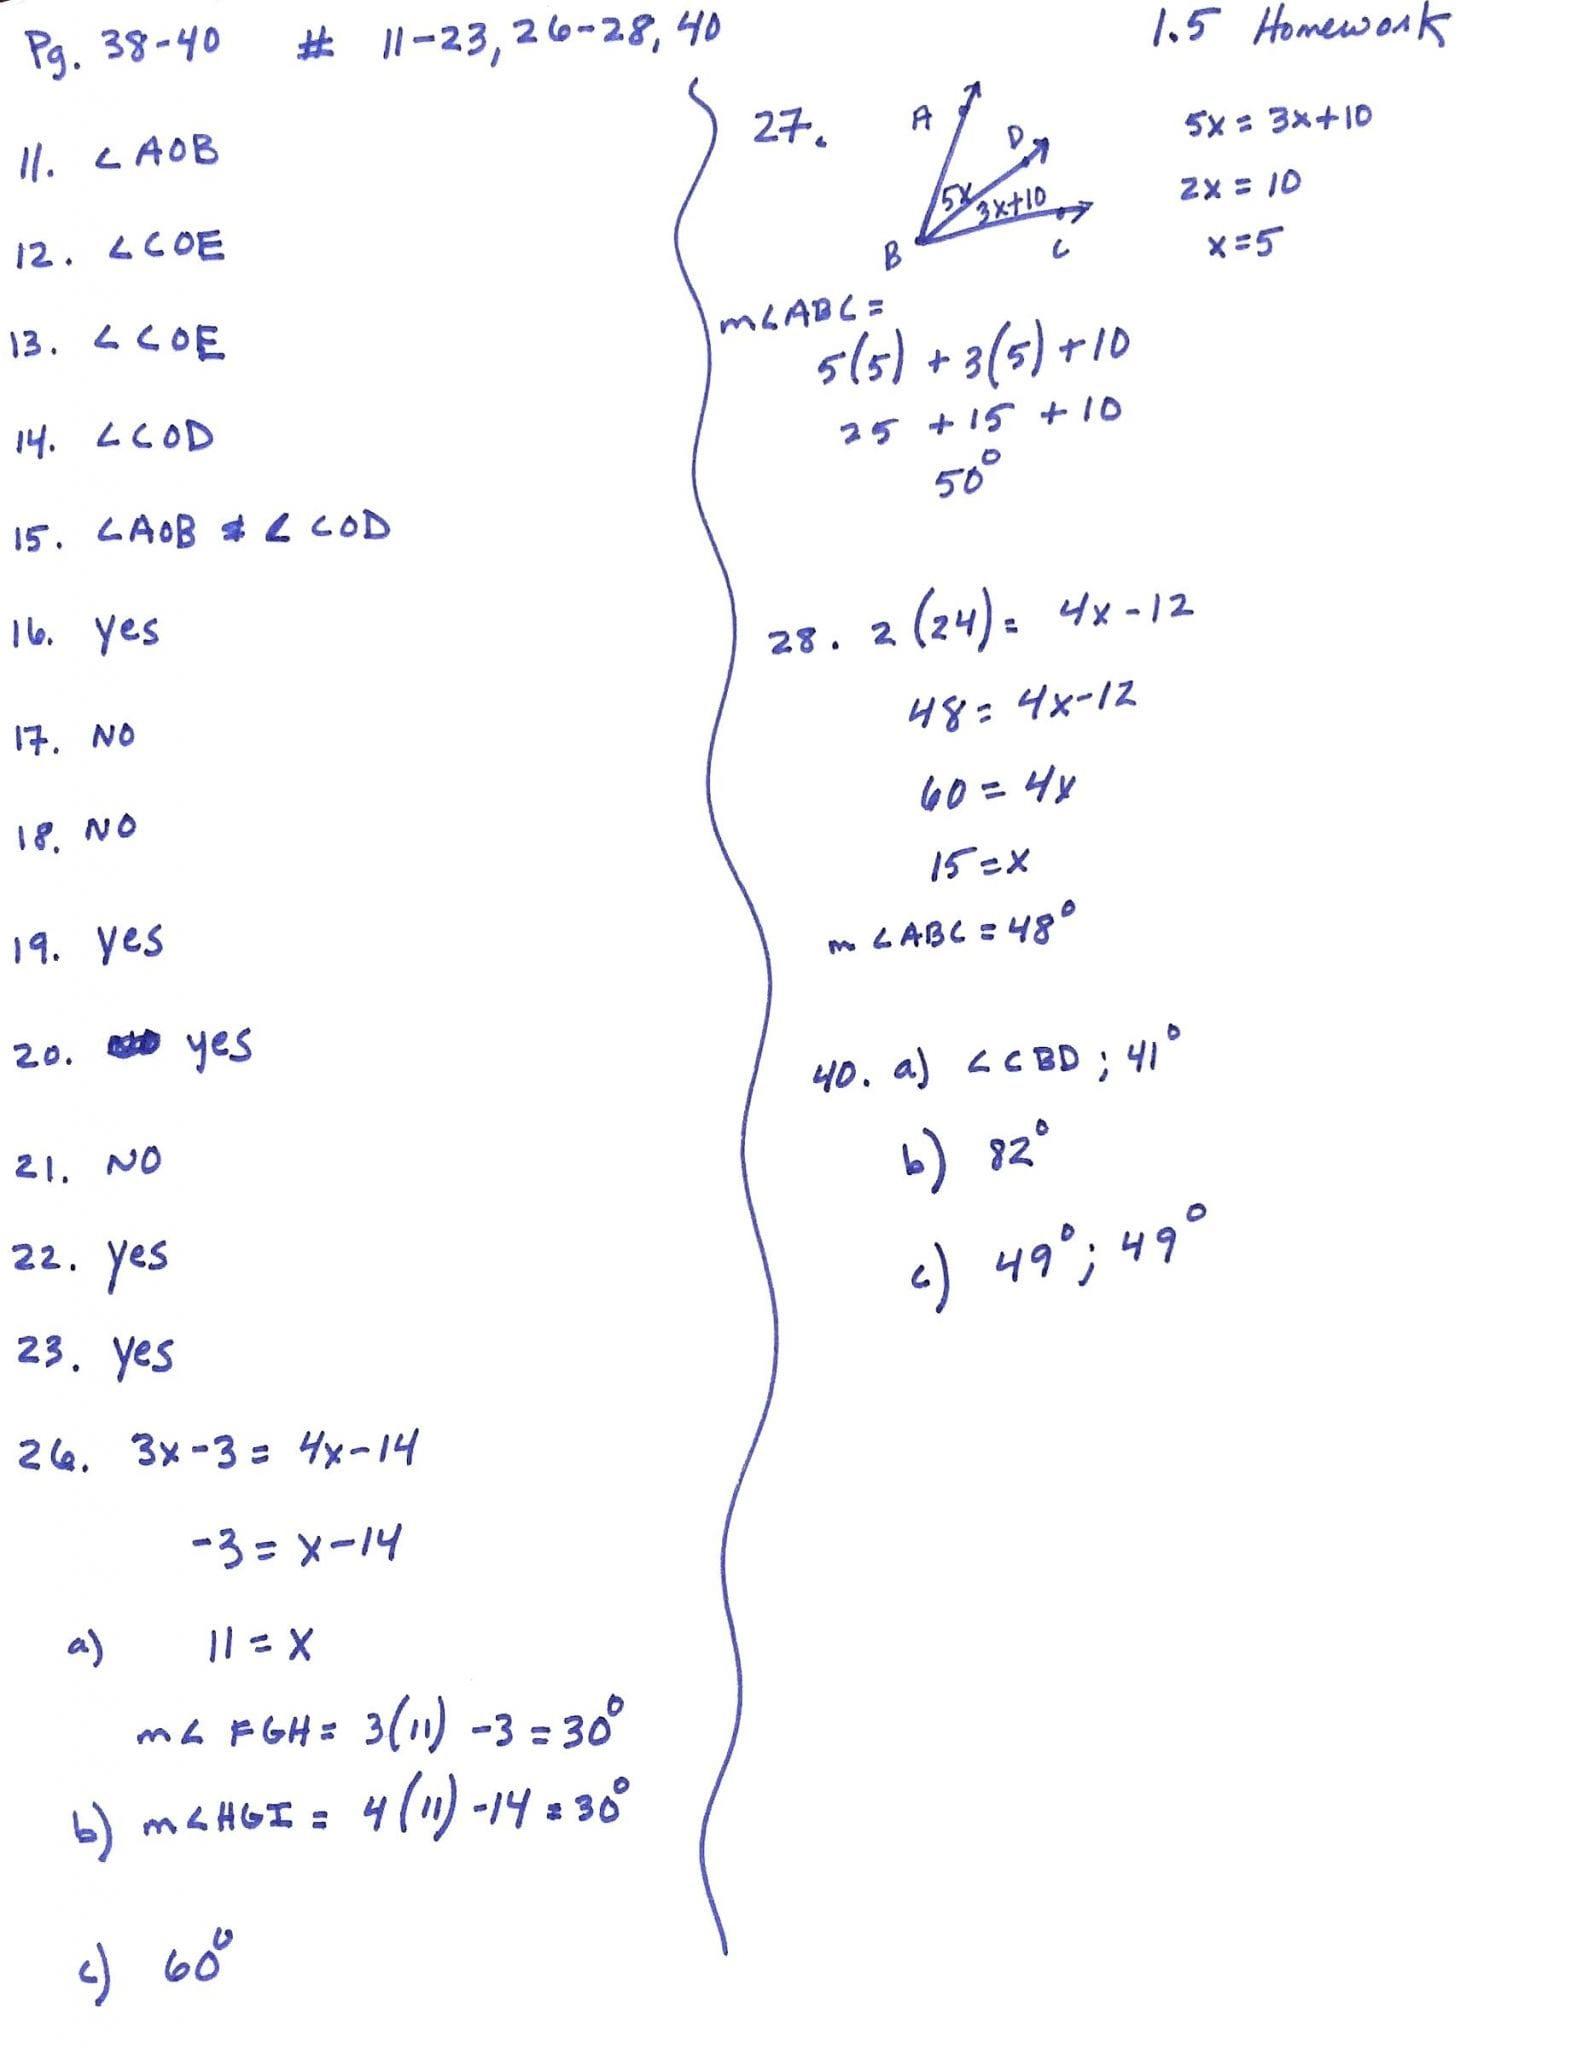 Linear Programming Worksheet Honors Algebra 2 Answers